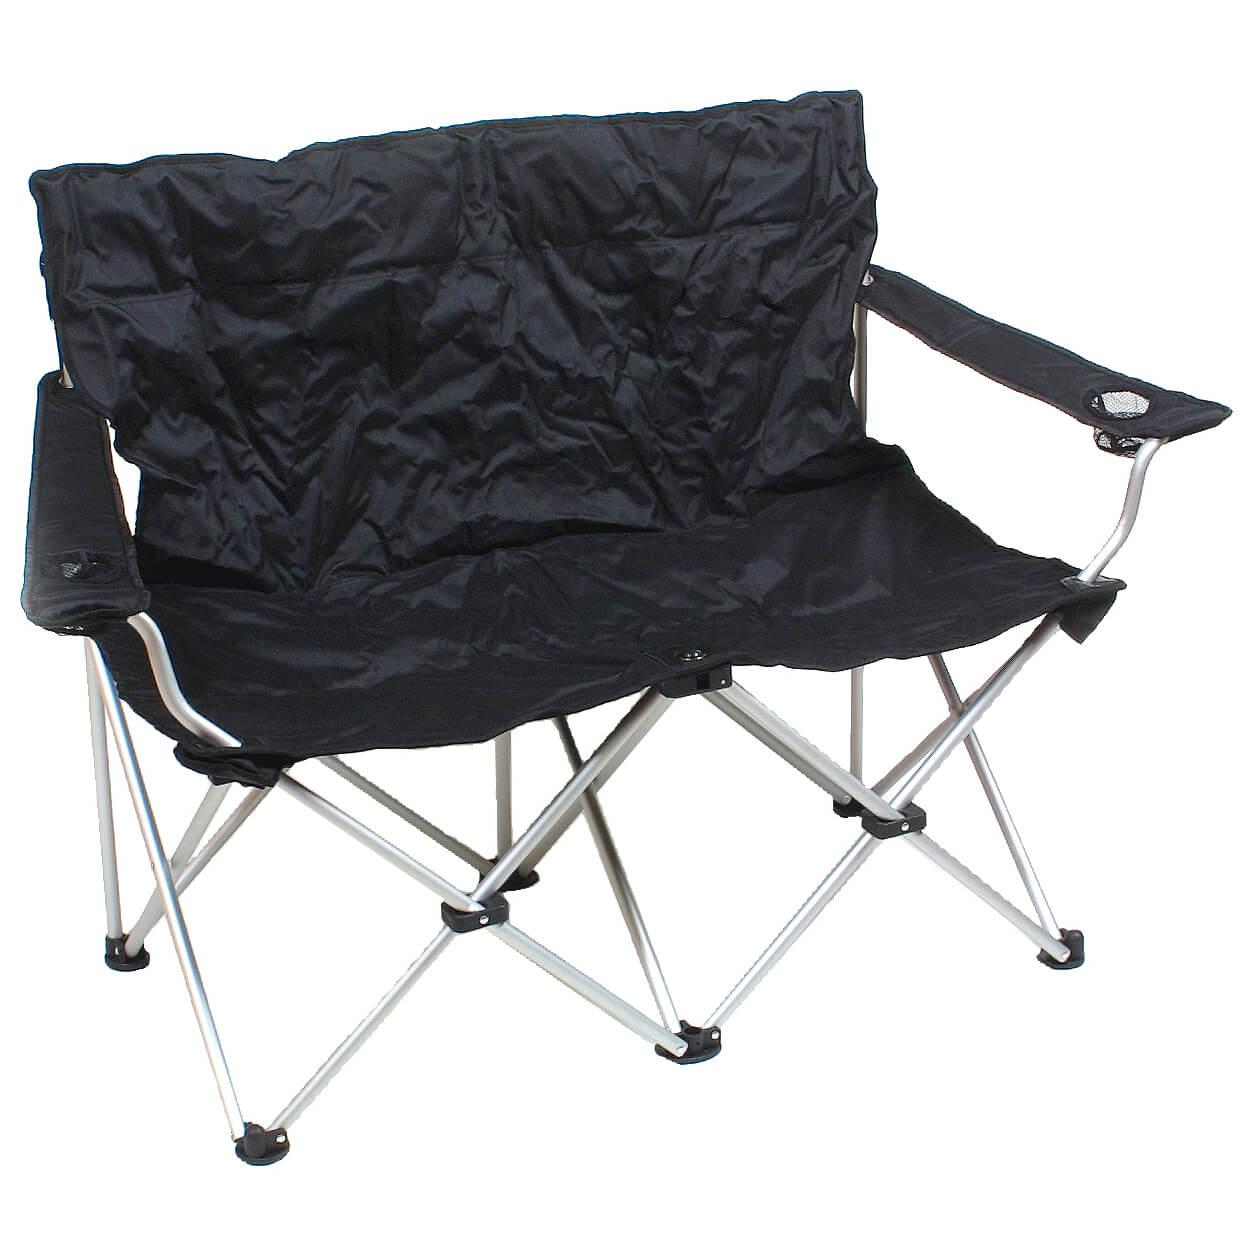 Relags Travelchair Love Seat Faltsofa Camping Chair Free UK